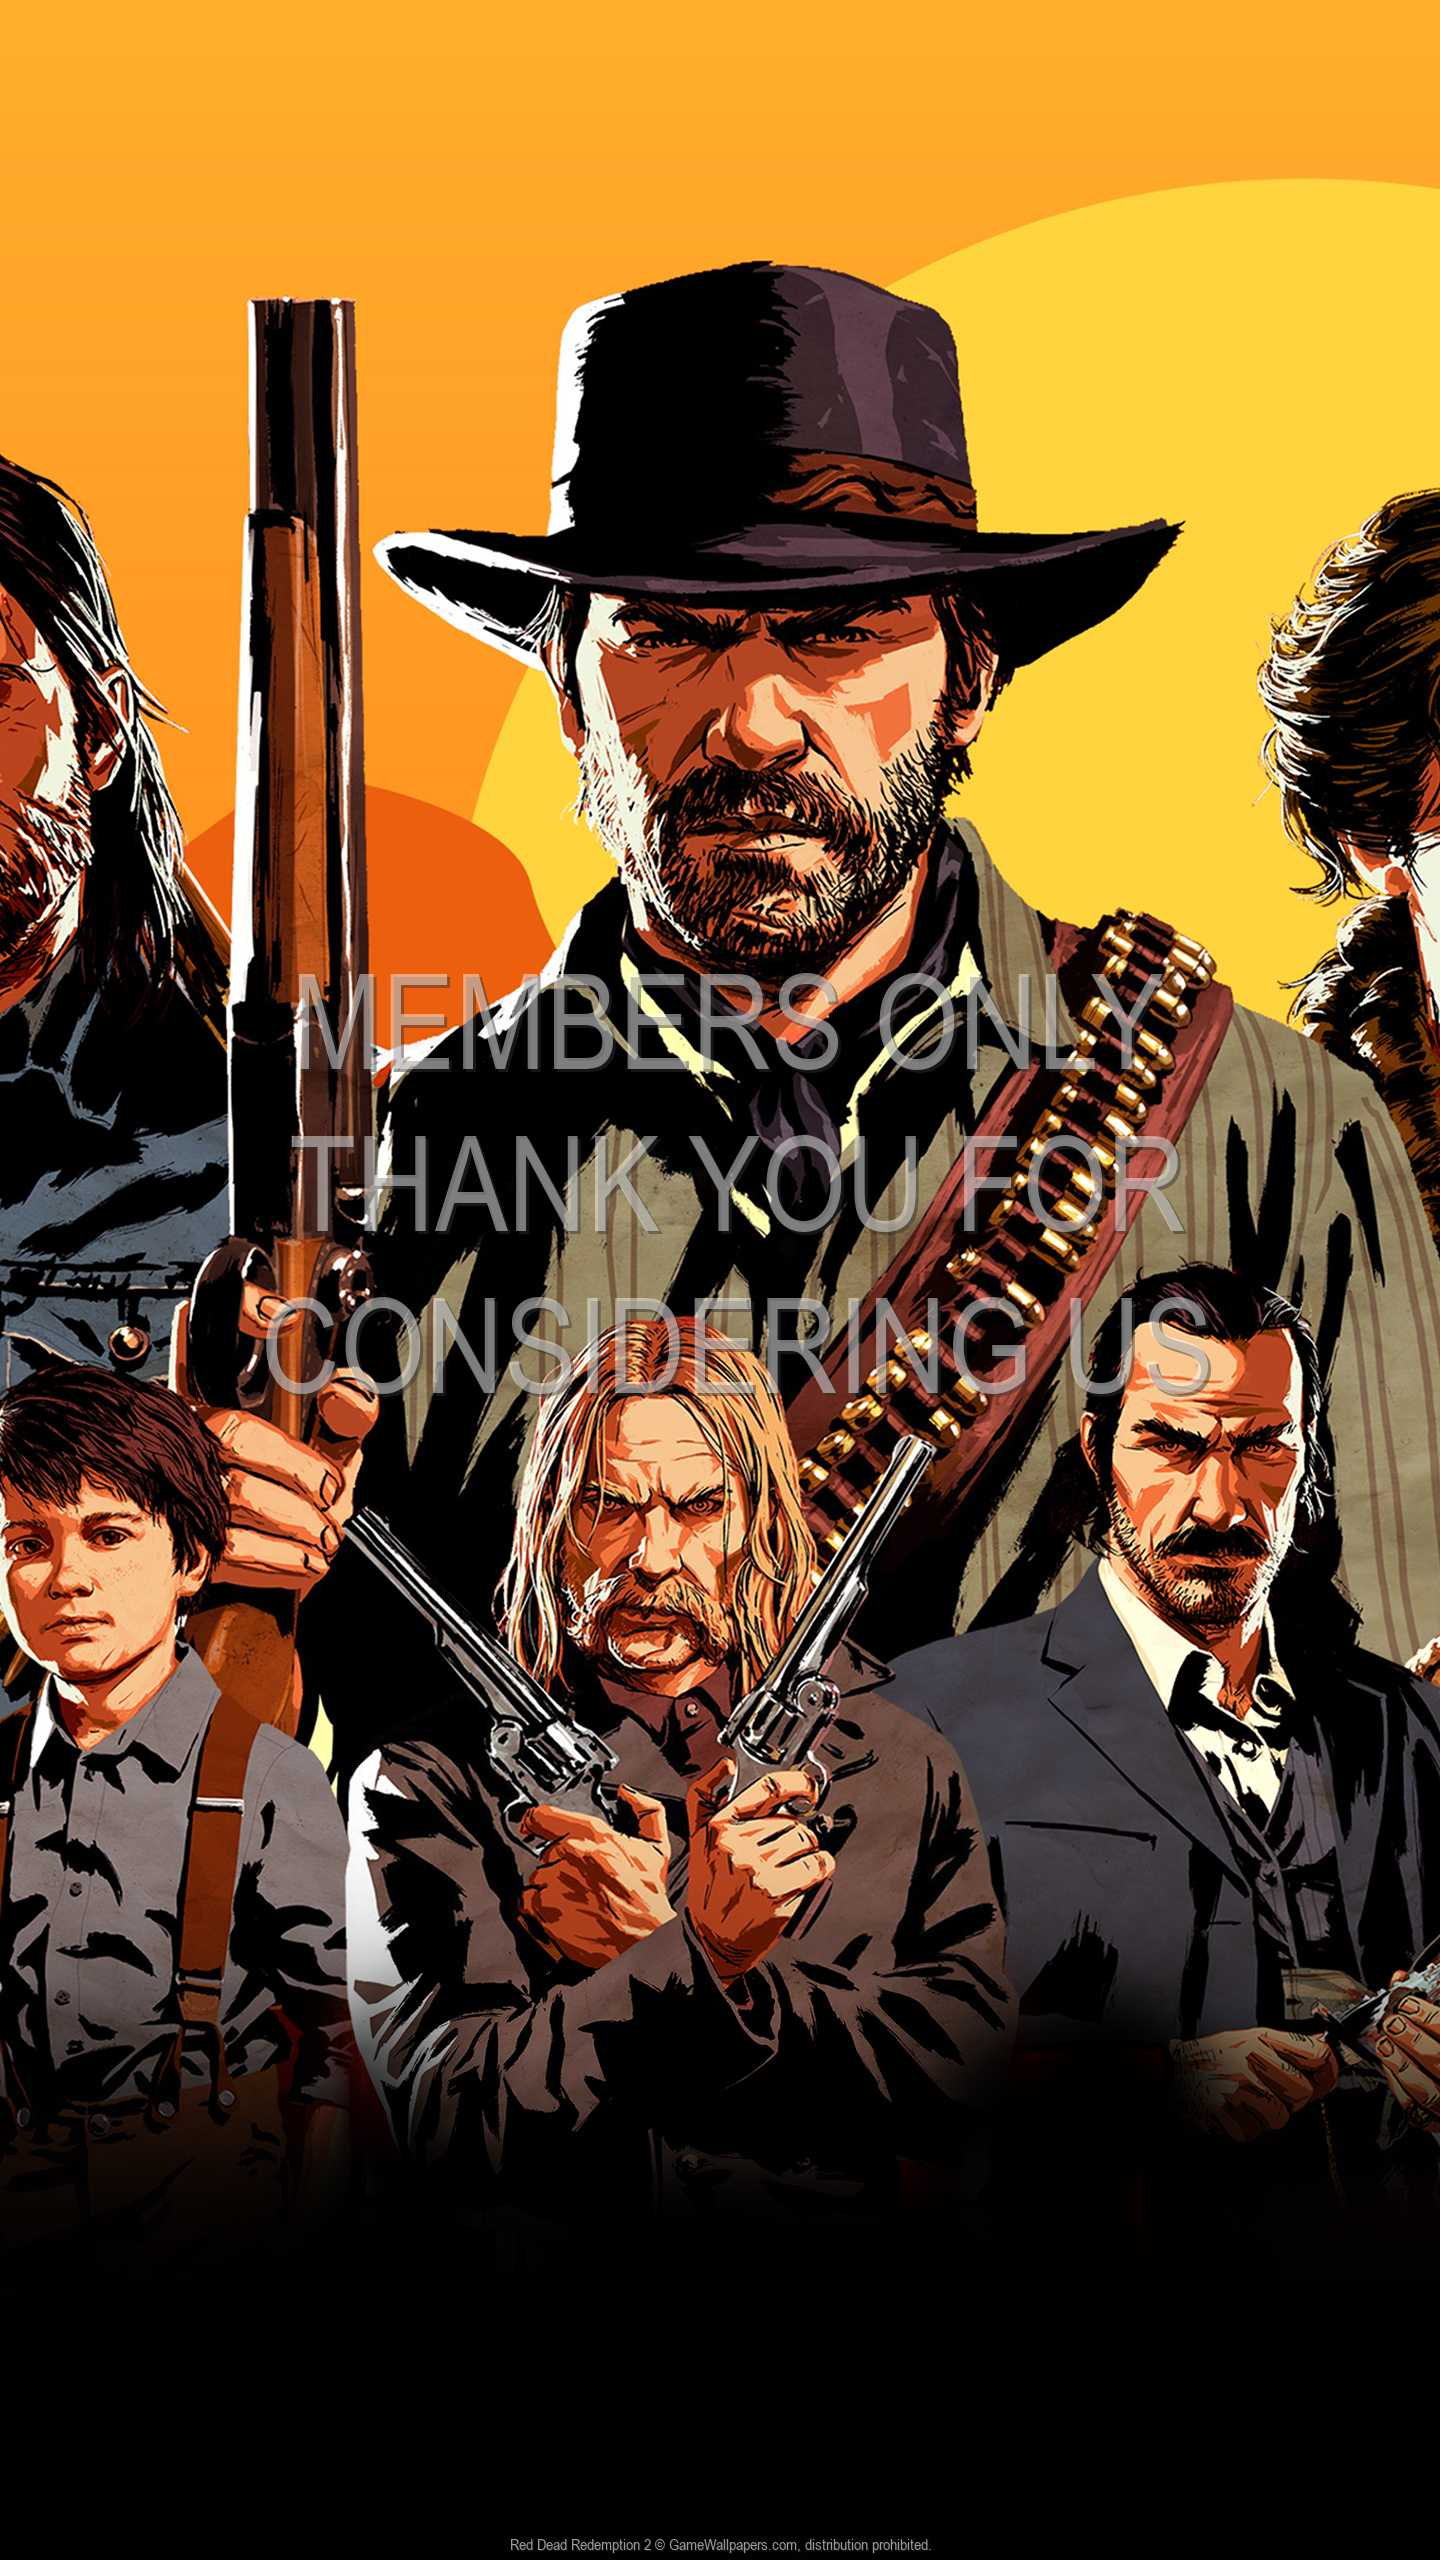 Red Dead Redemption 2 1440p Vertical Mobiele achtergrond 03